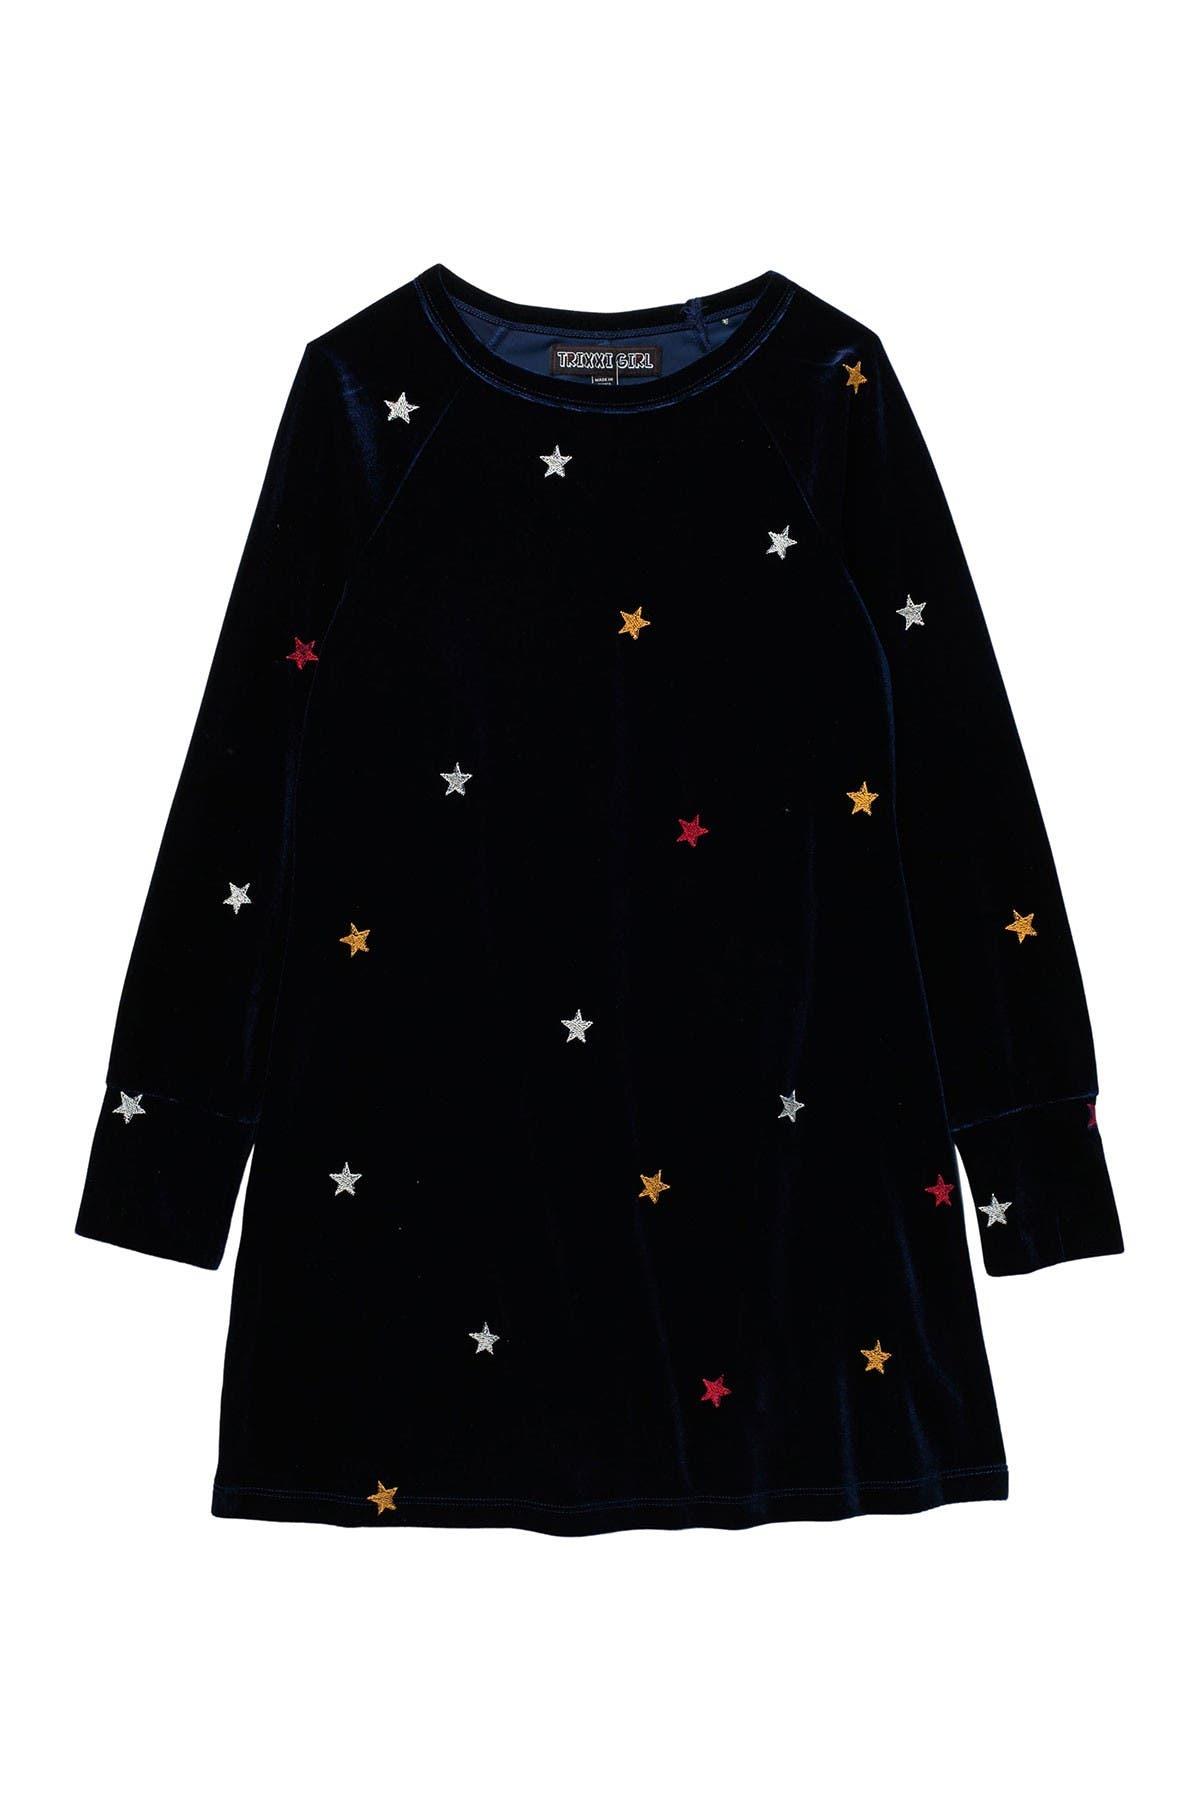 Image of Trixxi Velvet Star Embroidered Dress